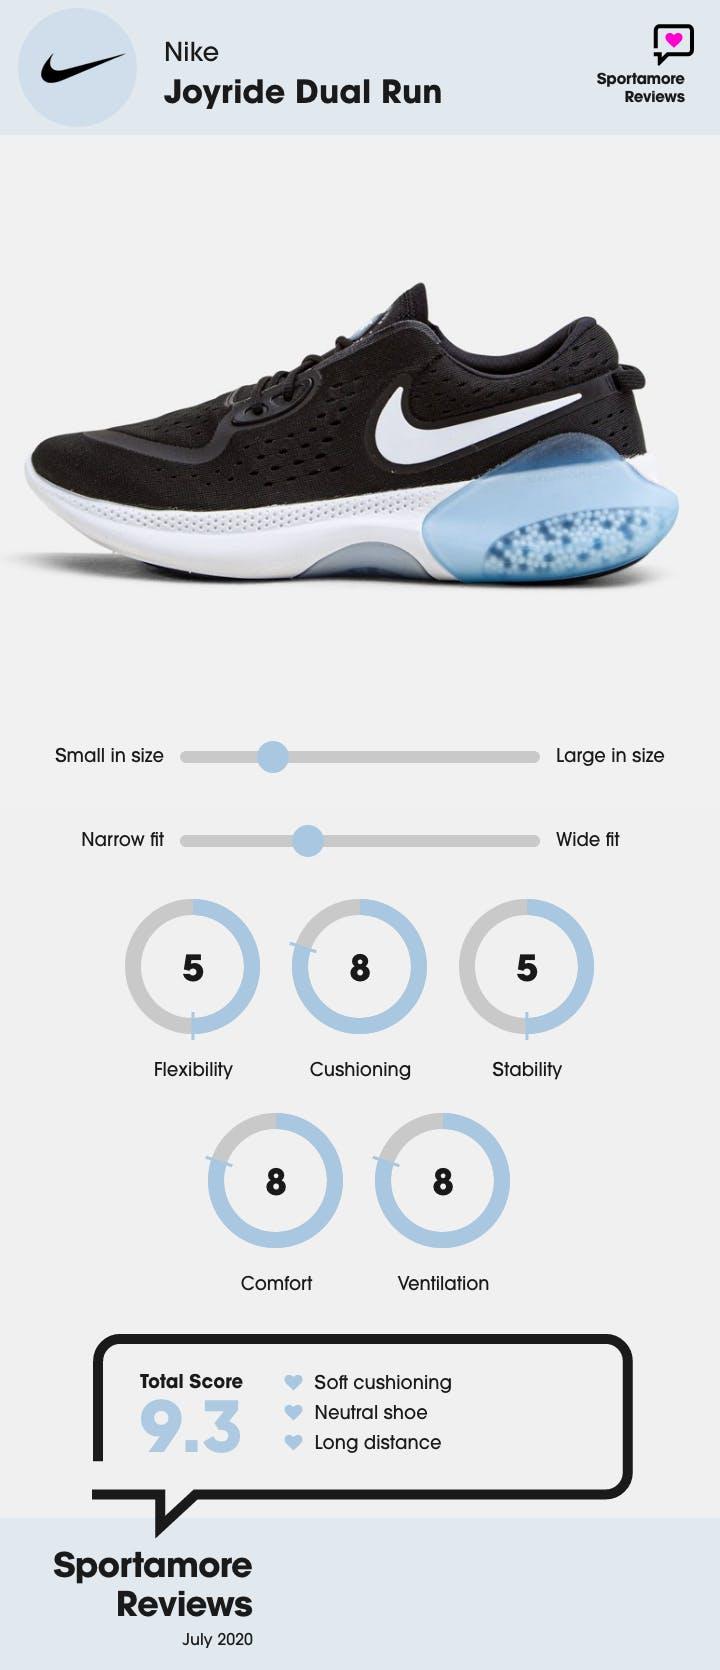 Nike_JoyrideRunDual.png